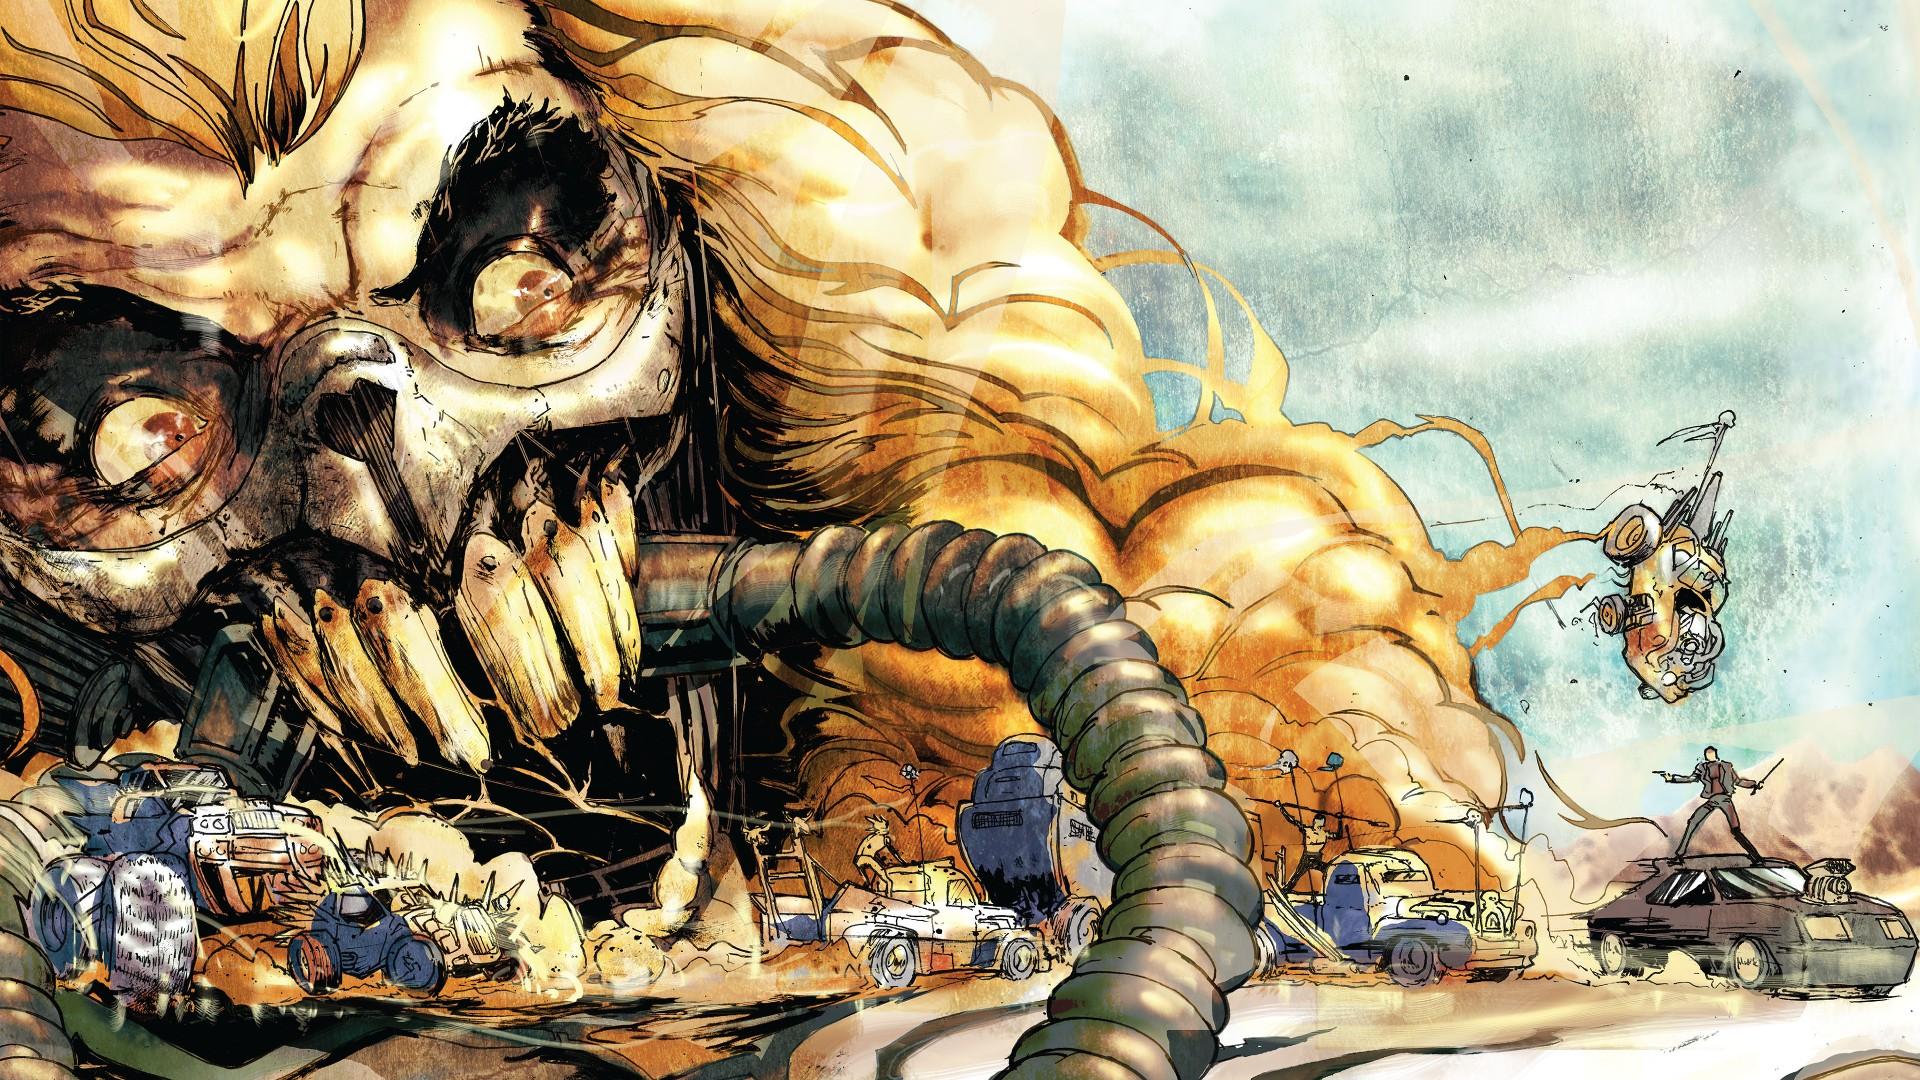 Mad Max Mad Max Fury Road comics ART